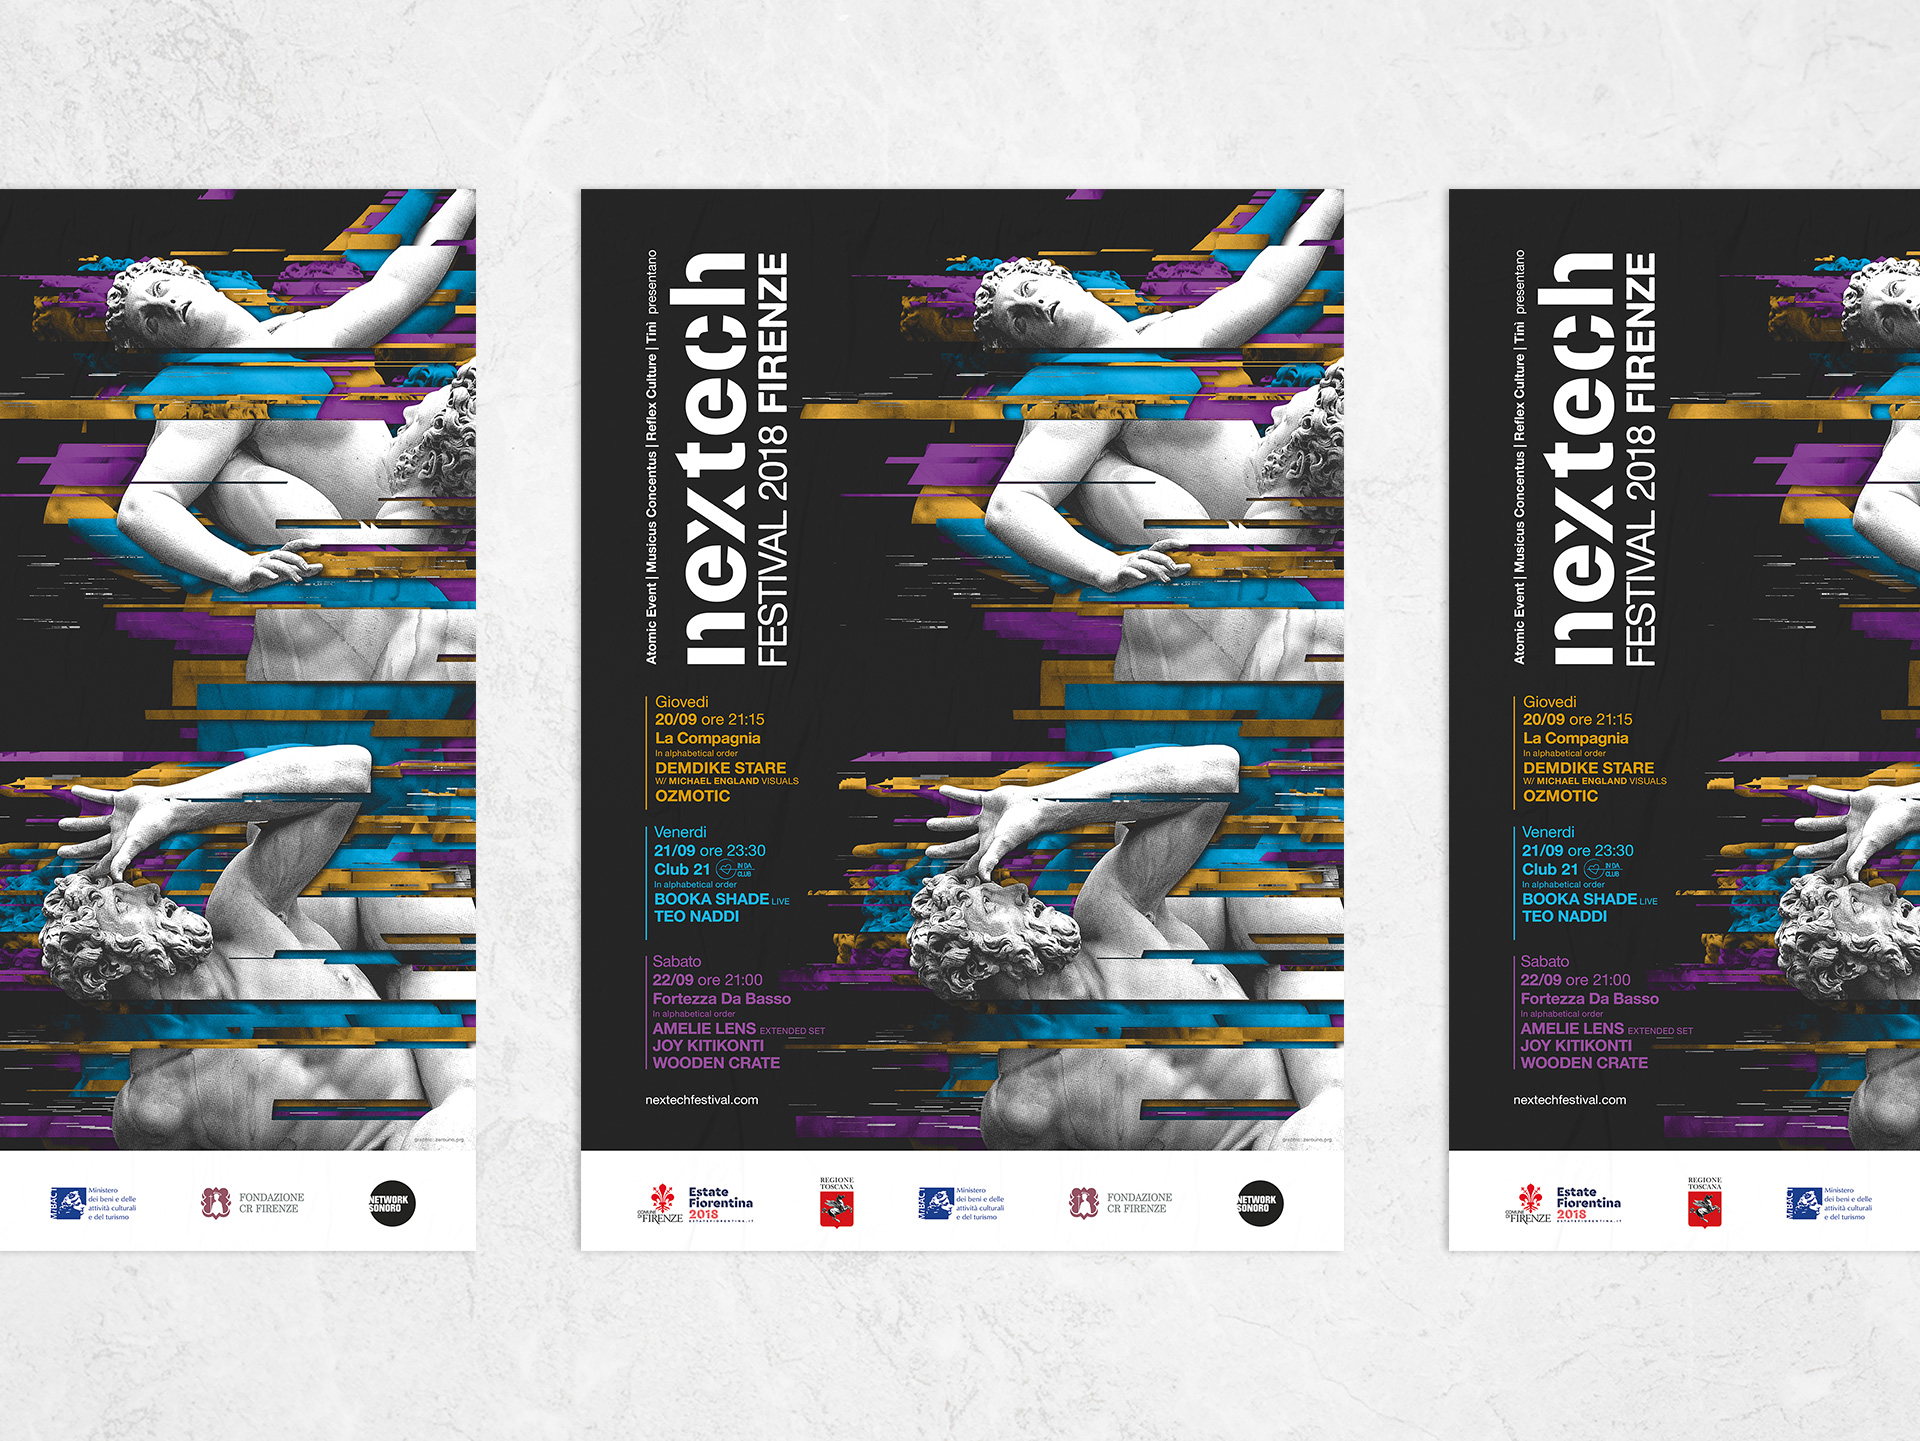 nextech-festival-2018-posters-zerouno-design